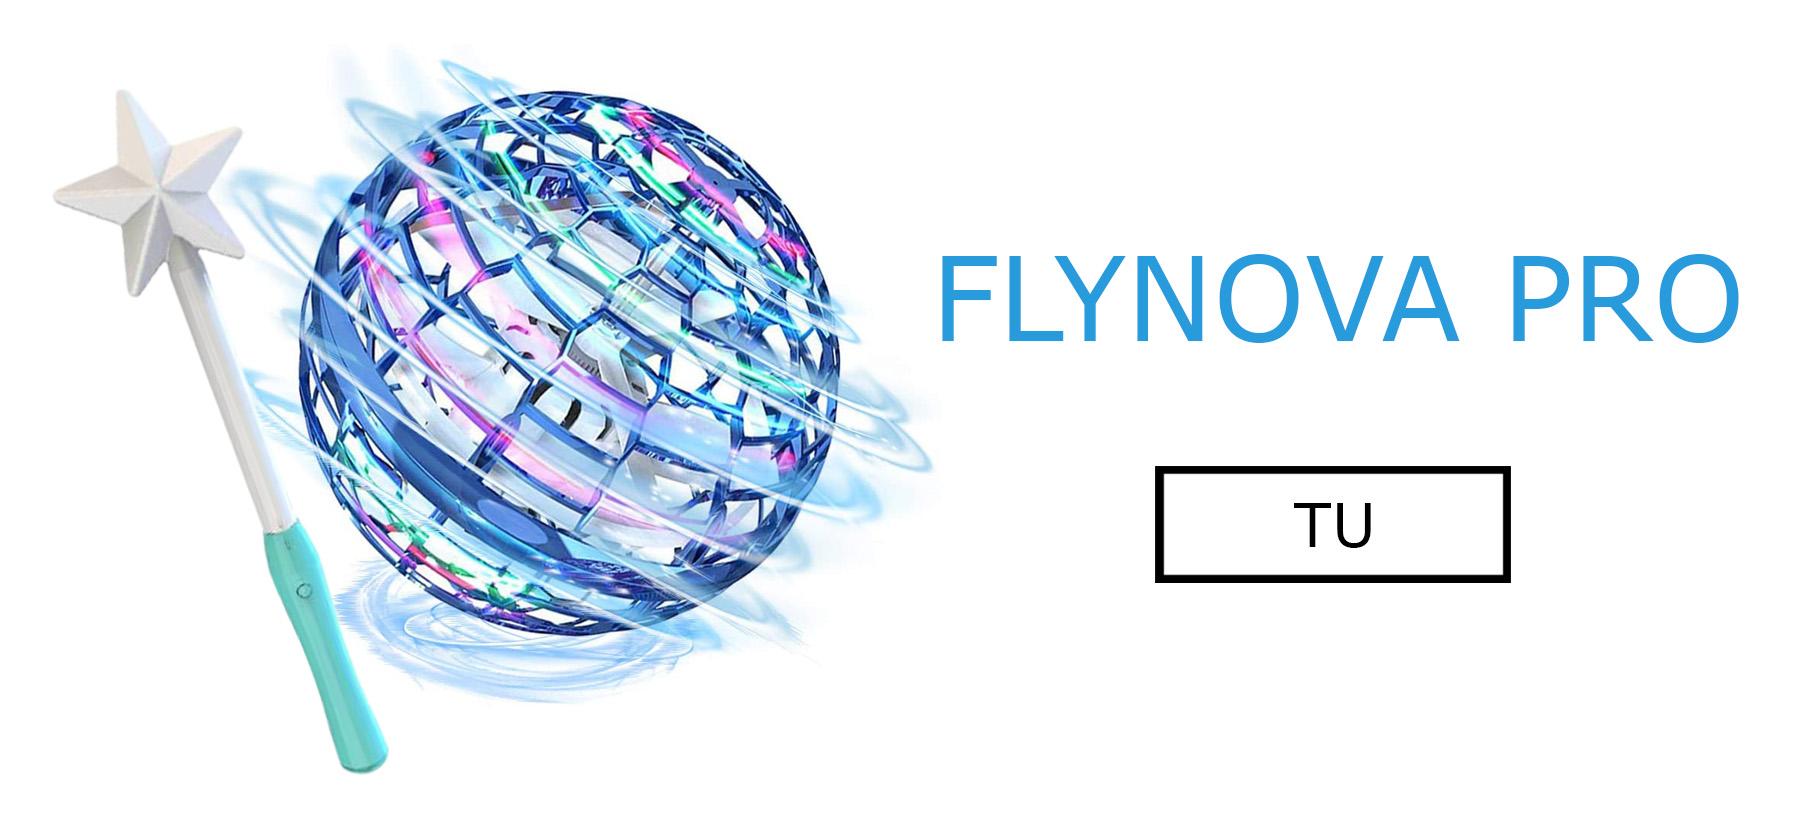 Flynova Pro